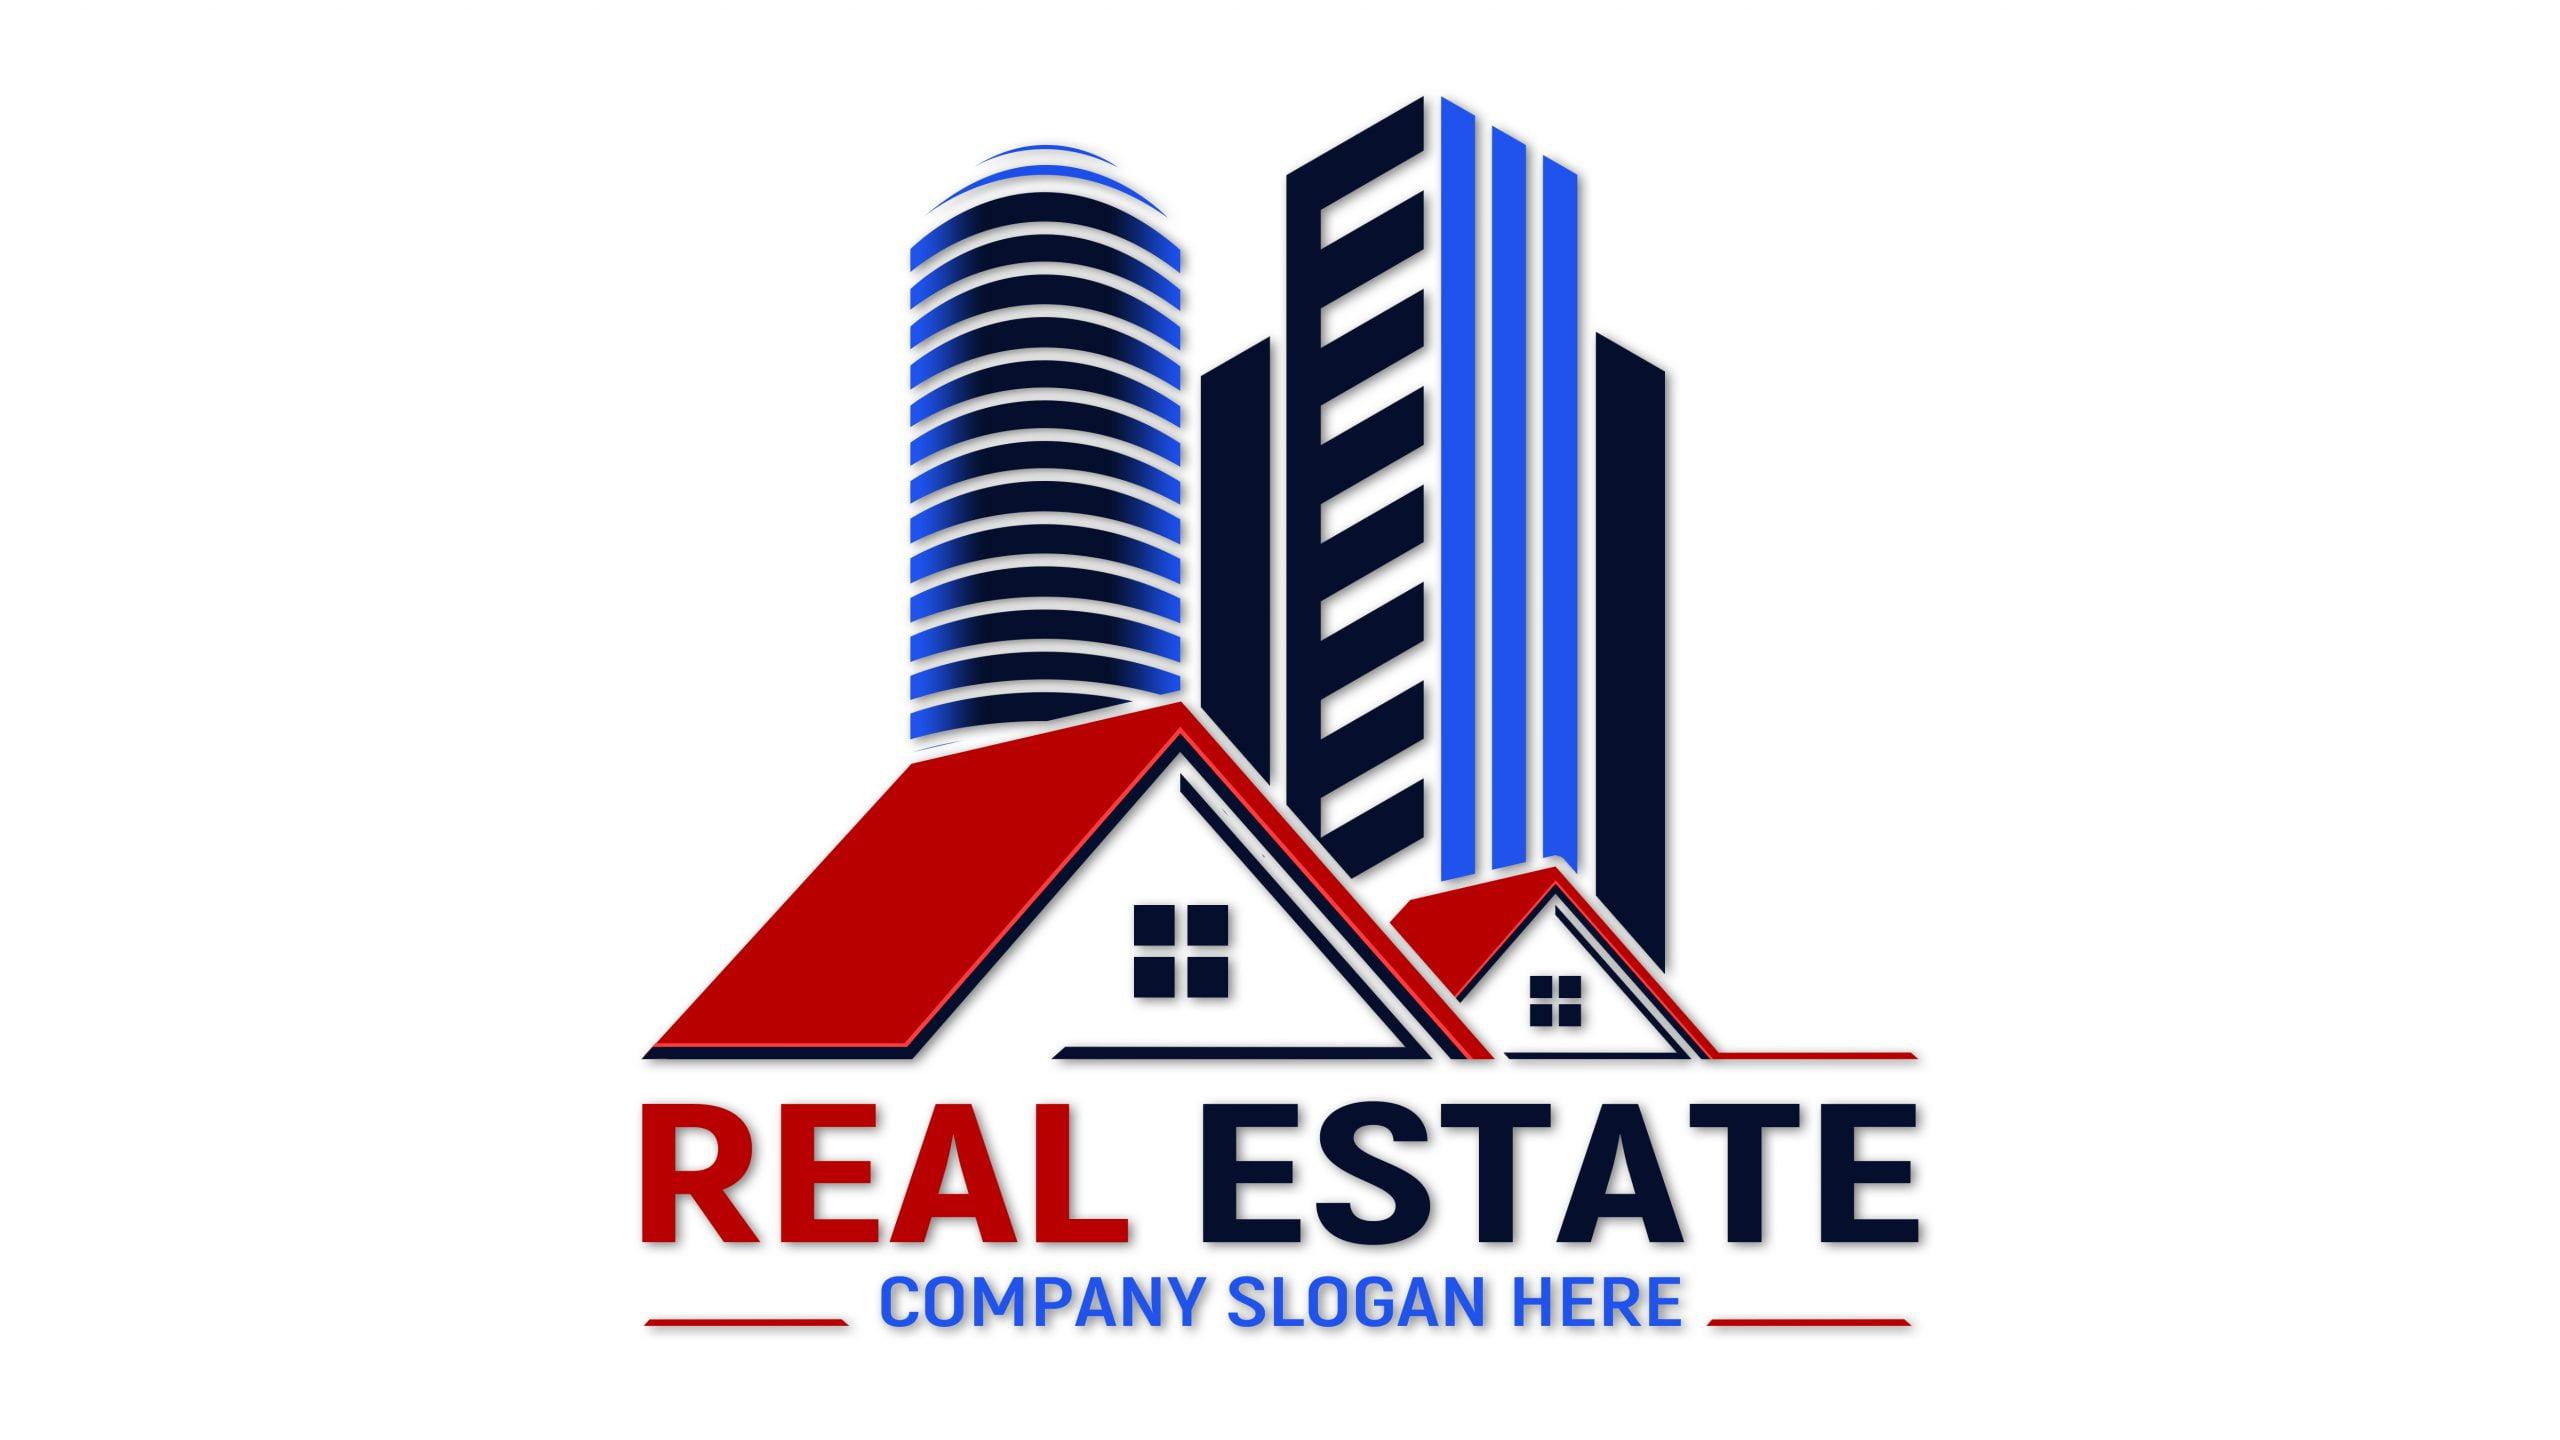 Editable Real Estate Logo Design